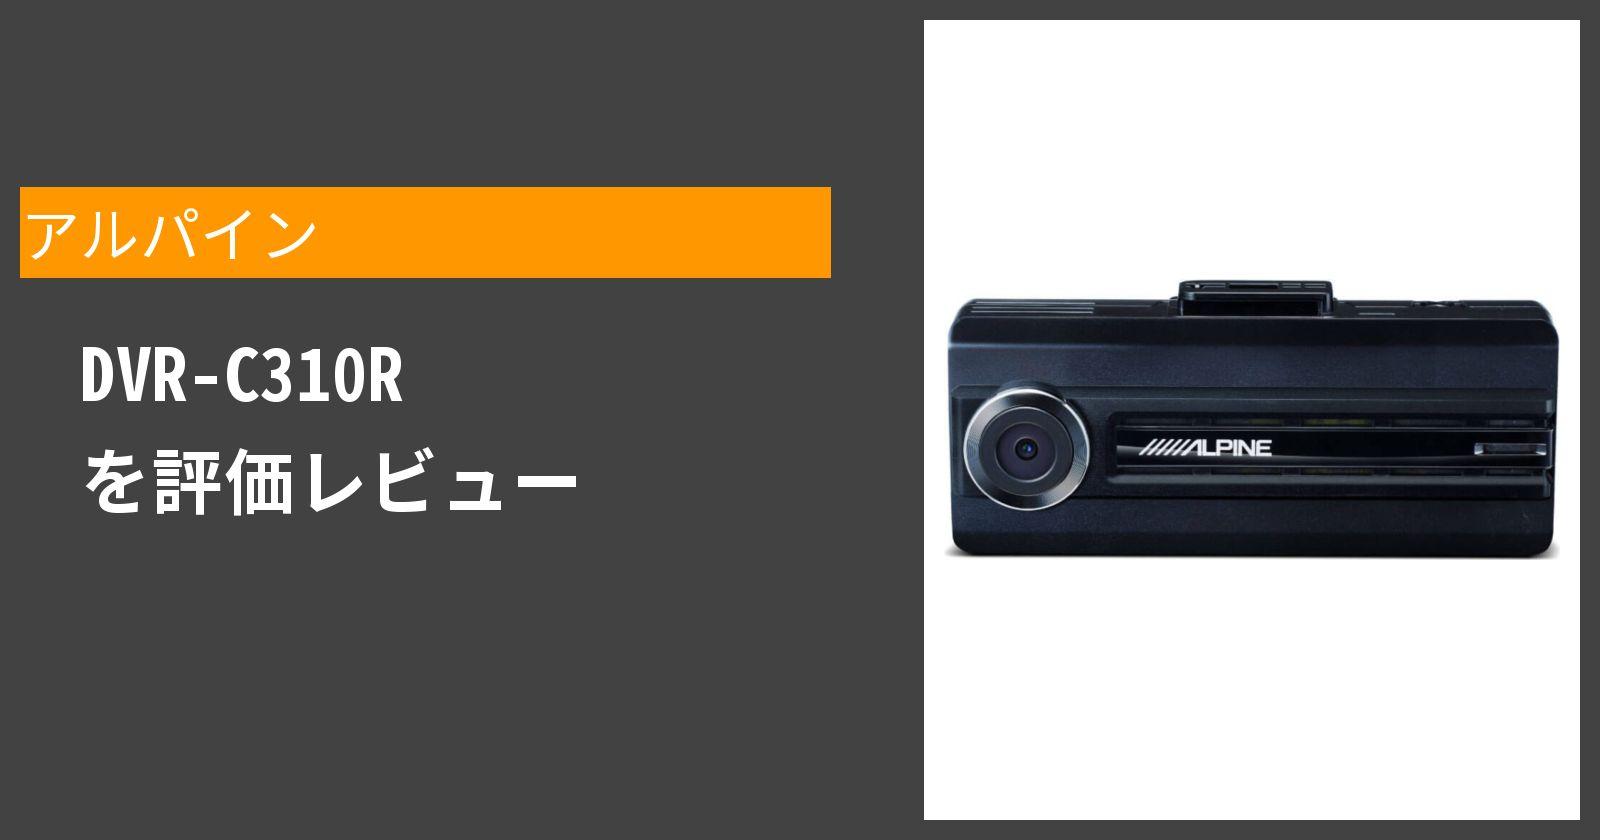 DVR-C310Rを徹底評価